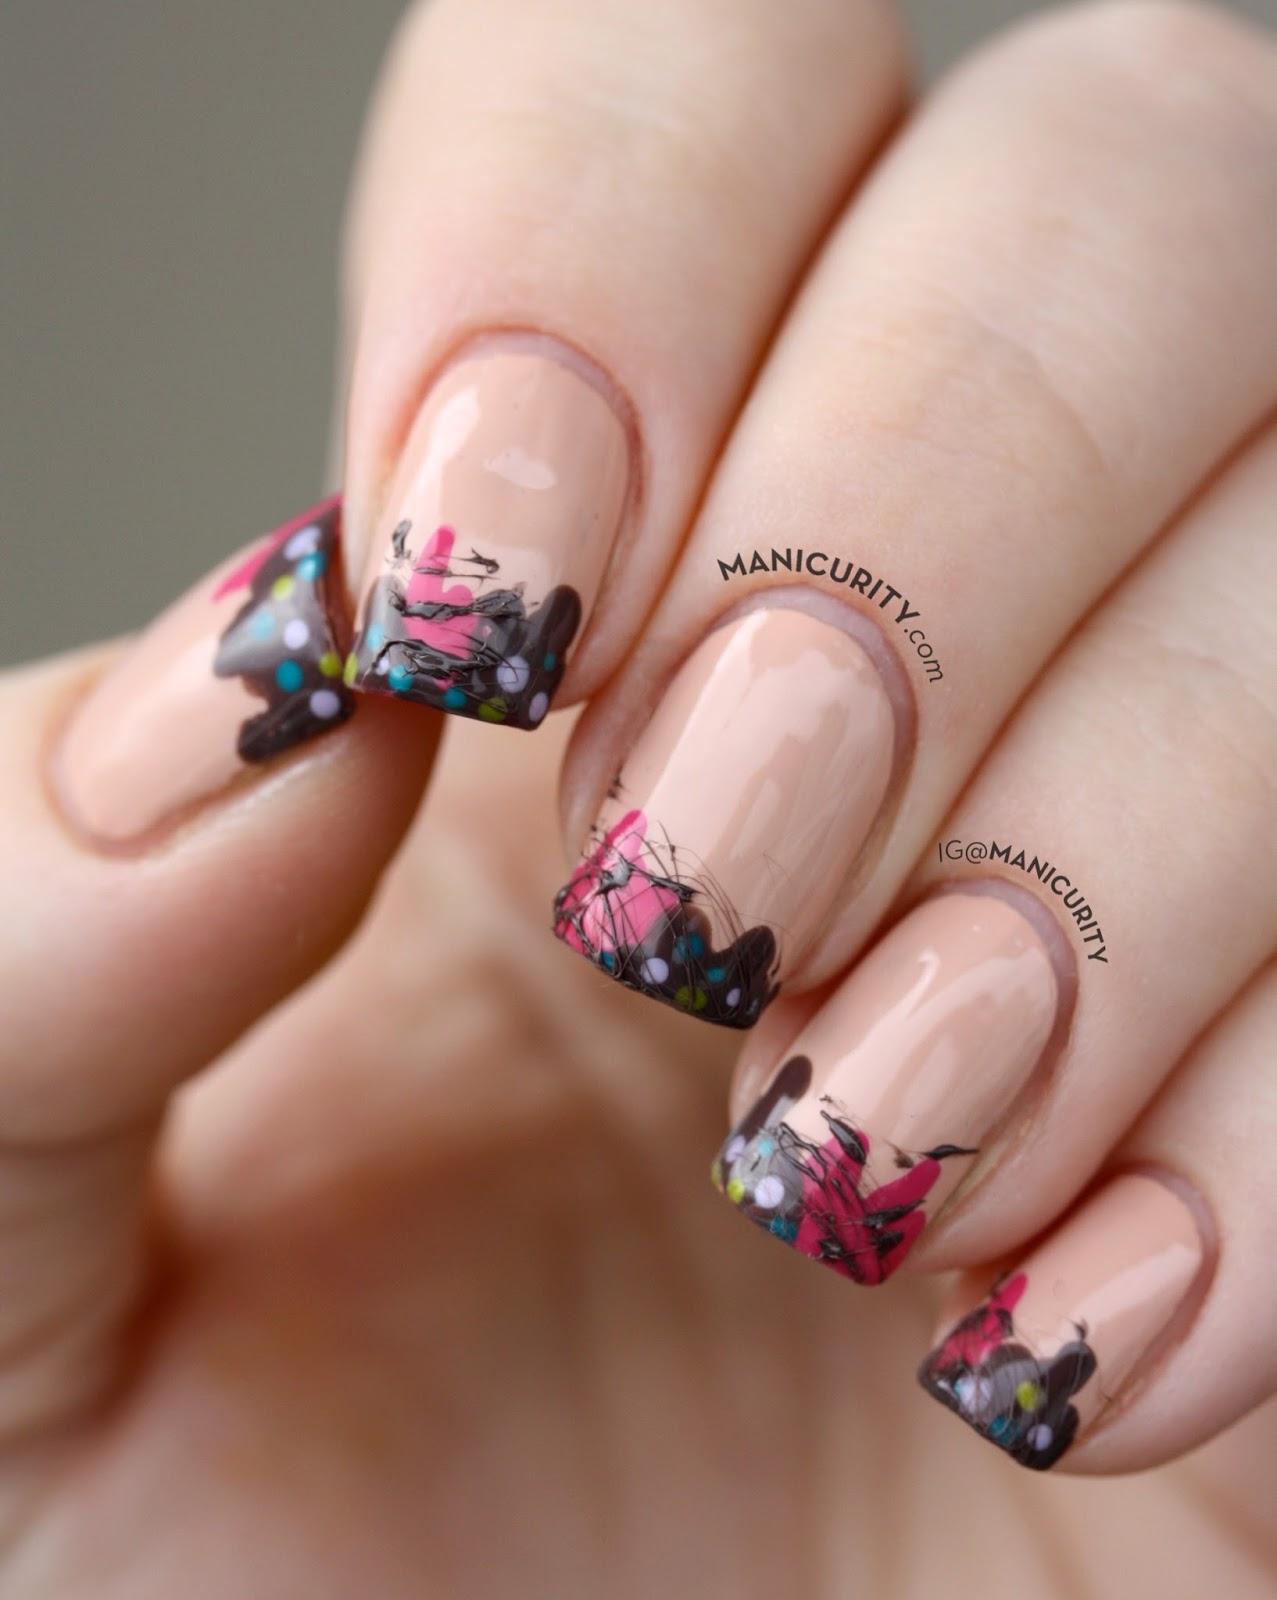 Manicurity | super cute Drippy Ice Cream Nails - with some Sugar-Spun Fudge!